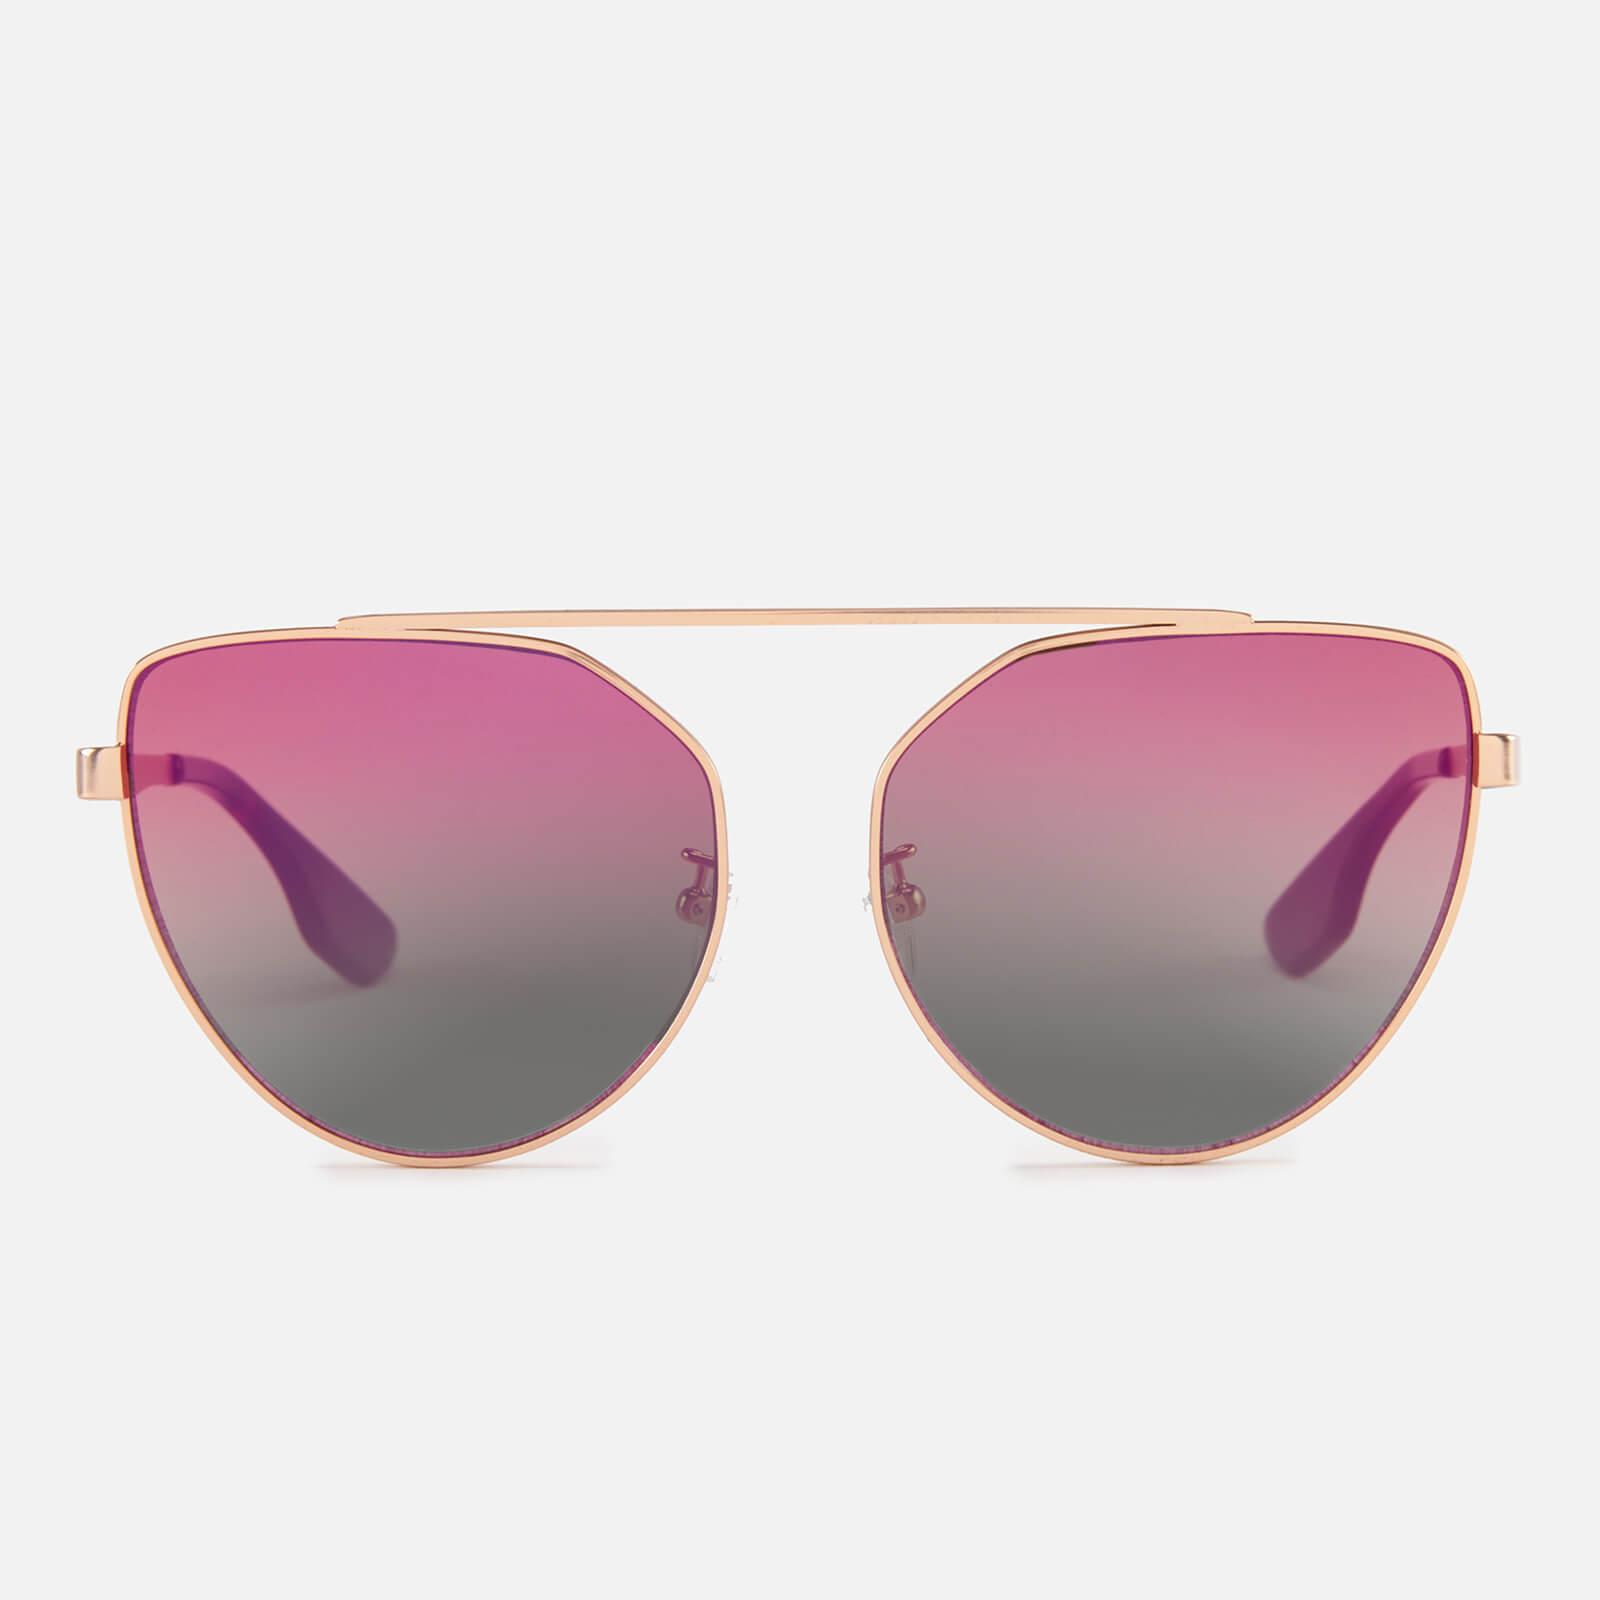 fa70818b4f McQ Alexander McQueen Women s Metal Frame Sunglasses - Gold Pink ...